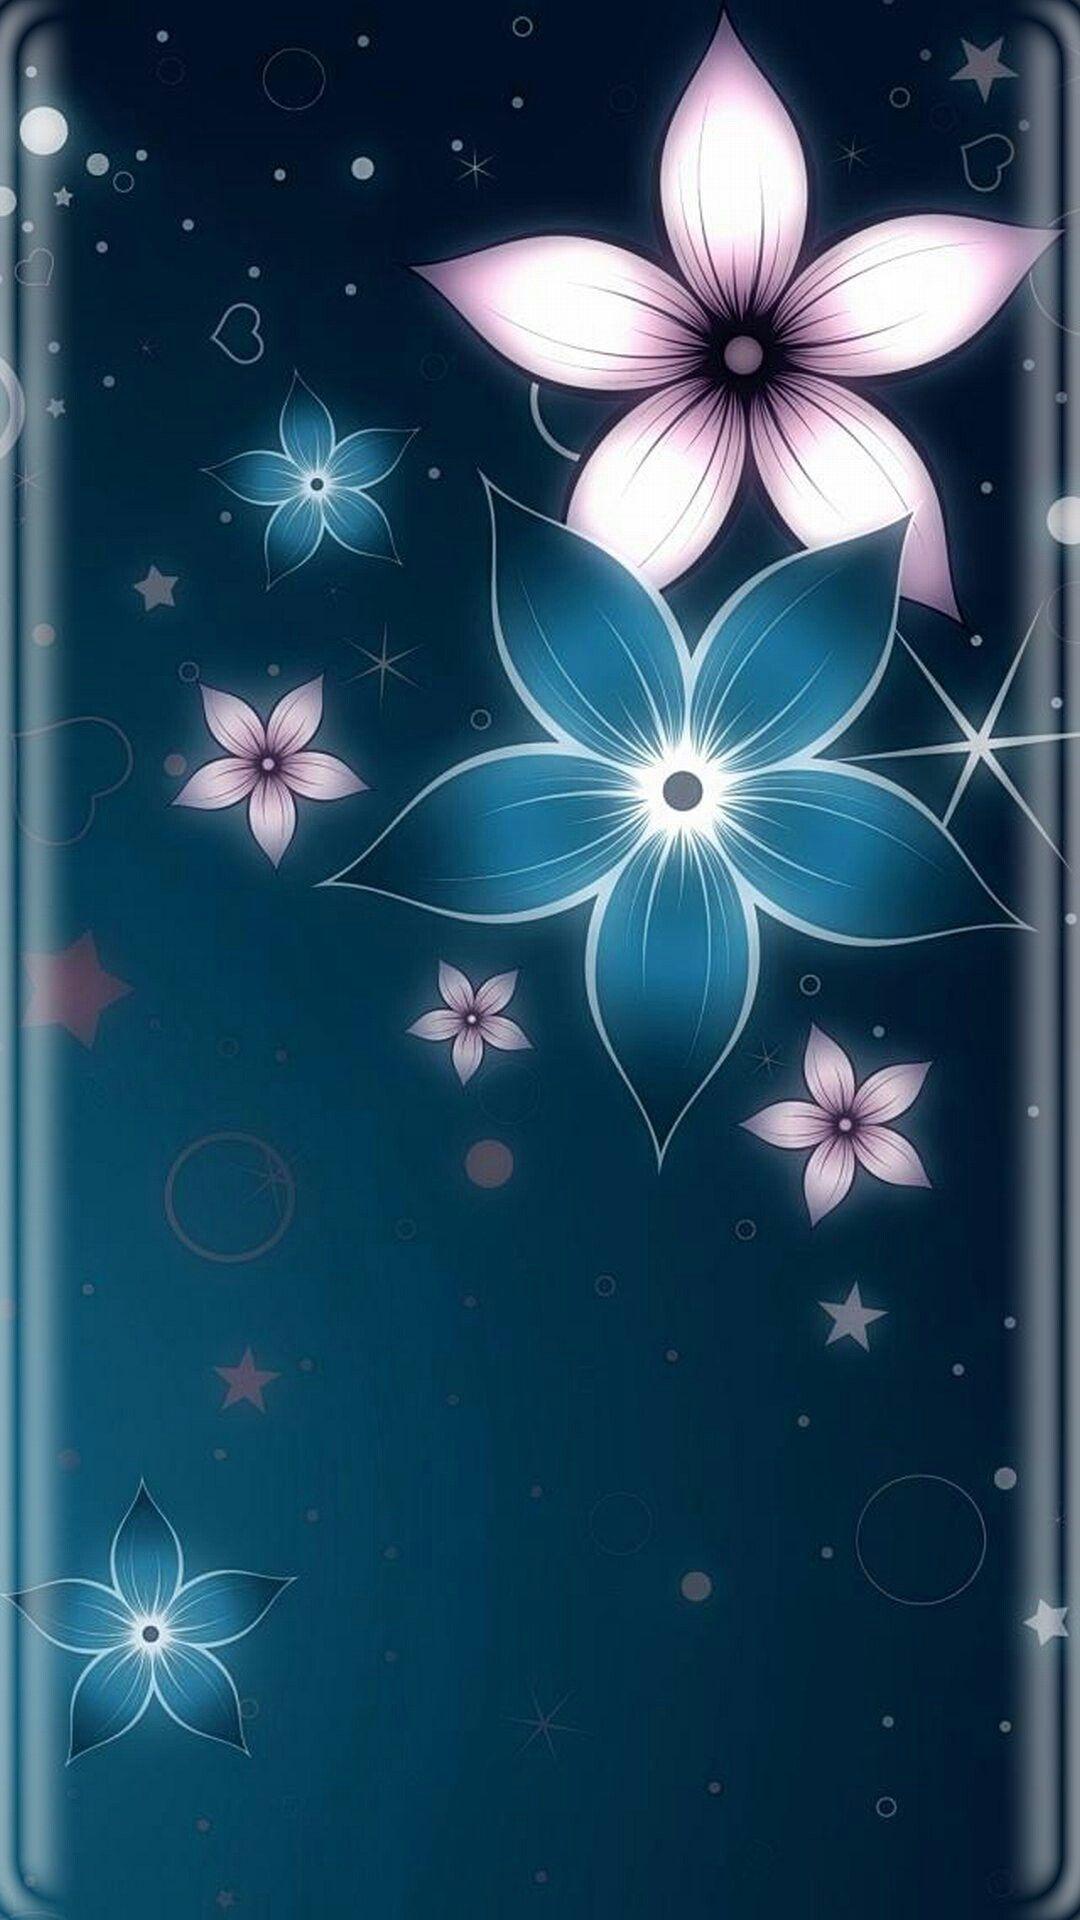 Samsung Iphone Edge Phonetelefon 3d Wallpaper Digital Flowers Art Wallpaper Phone Wallpaper